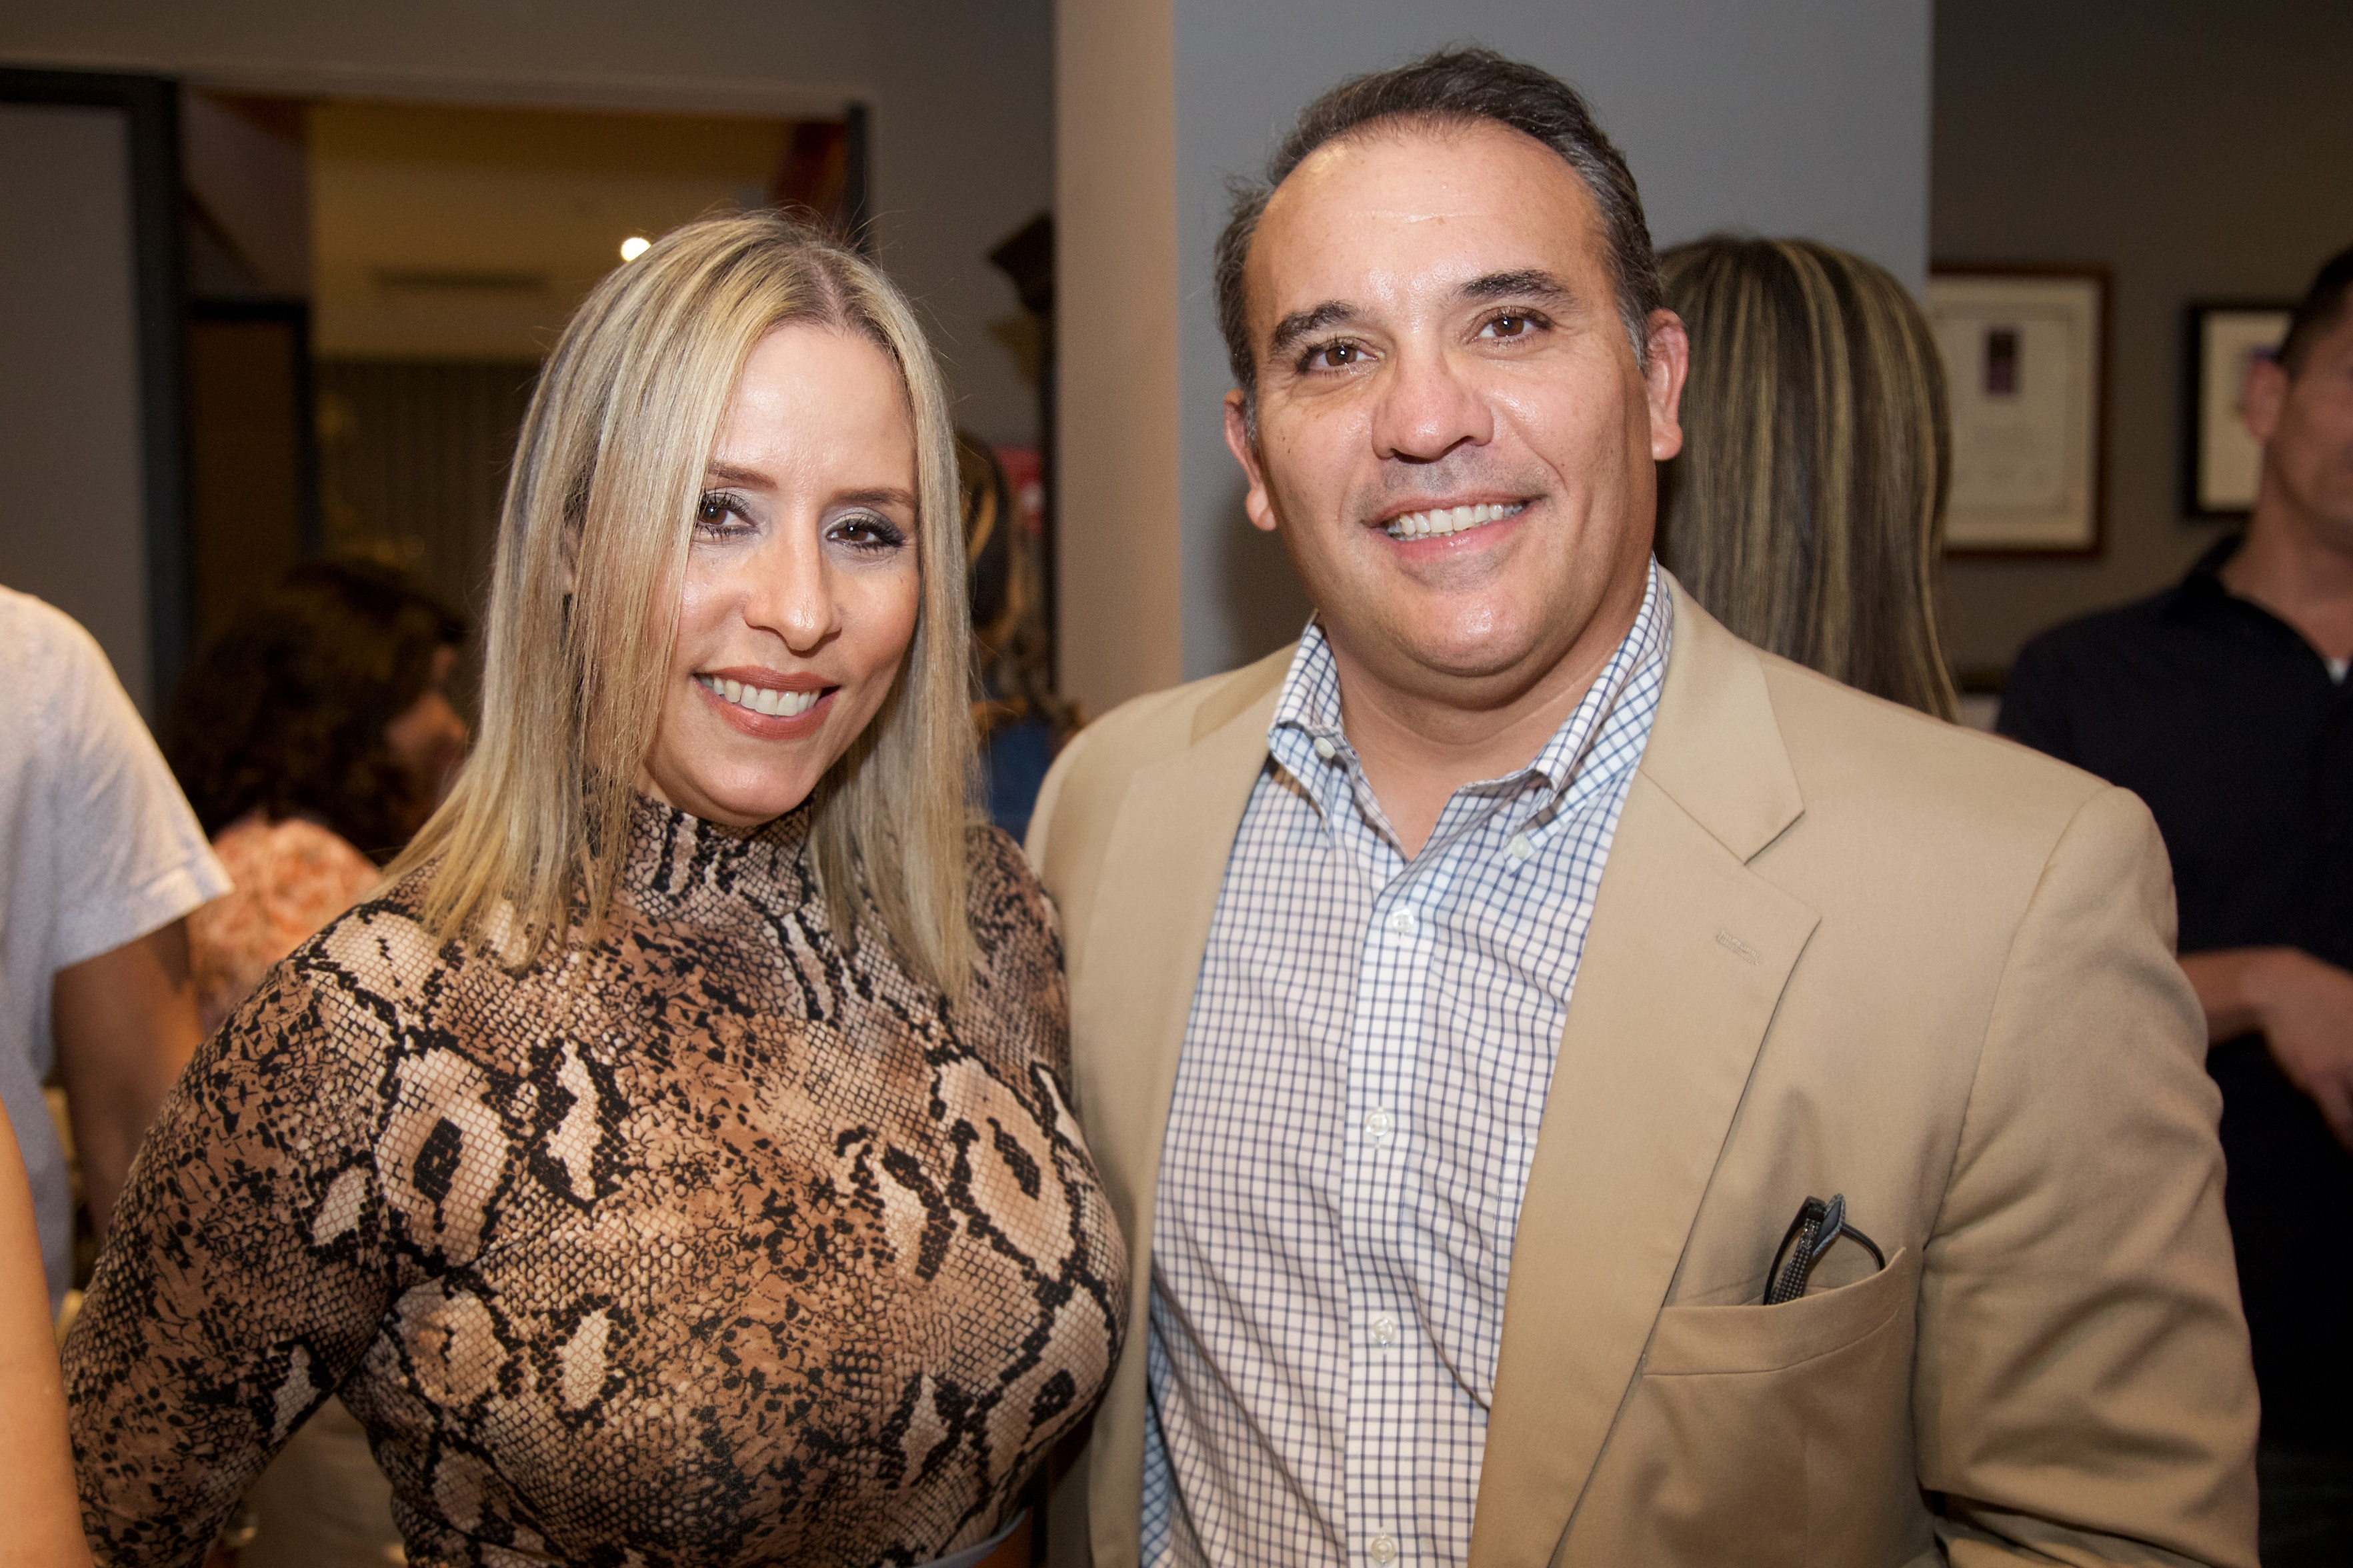 Livette Torres y Pedro Zorrilla (Nichole Saldarriaga)